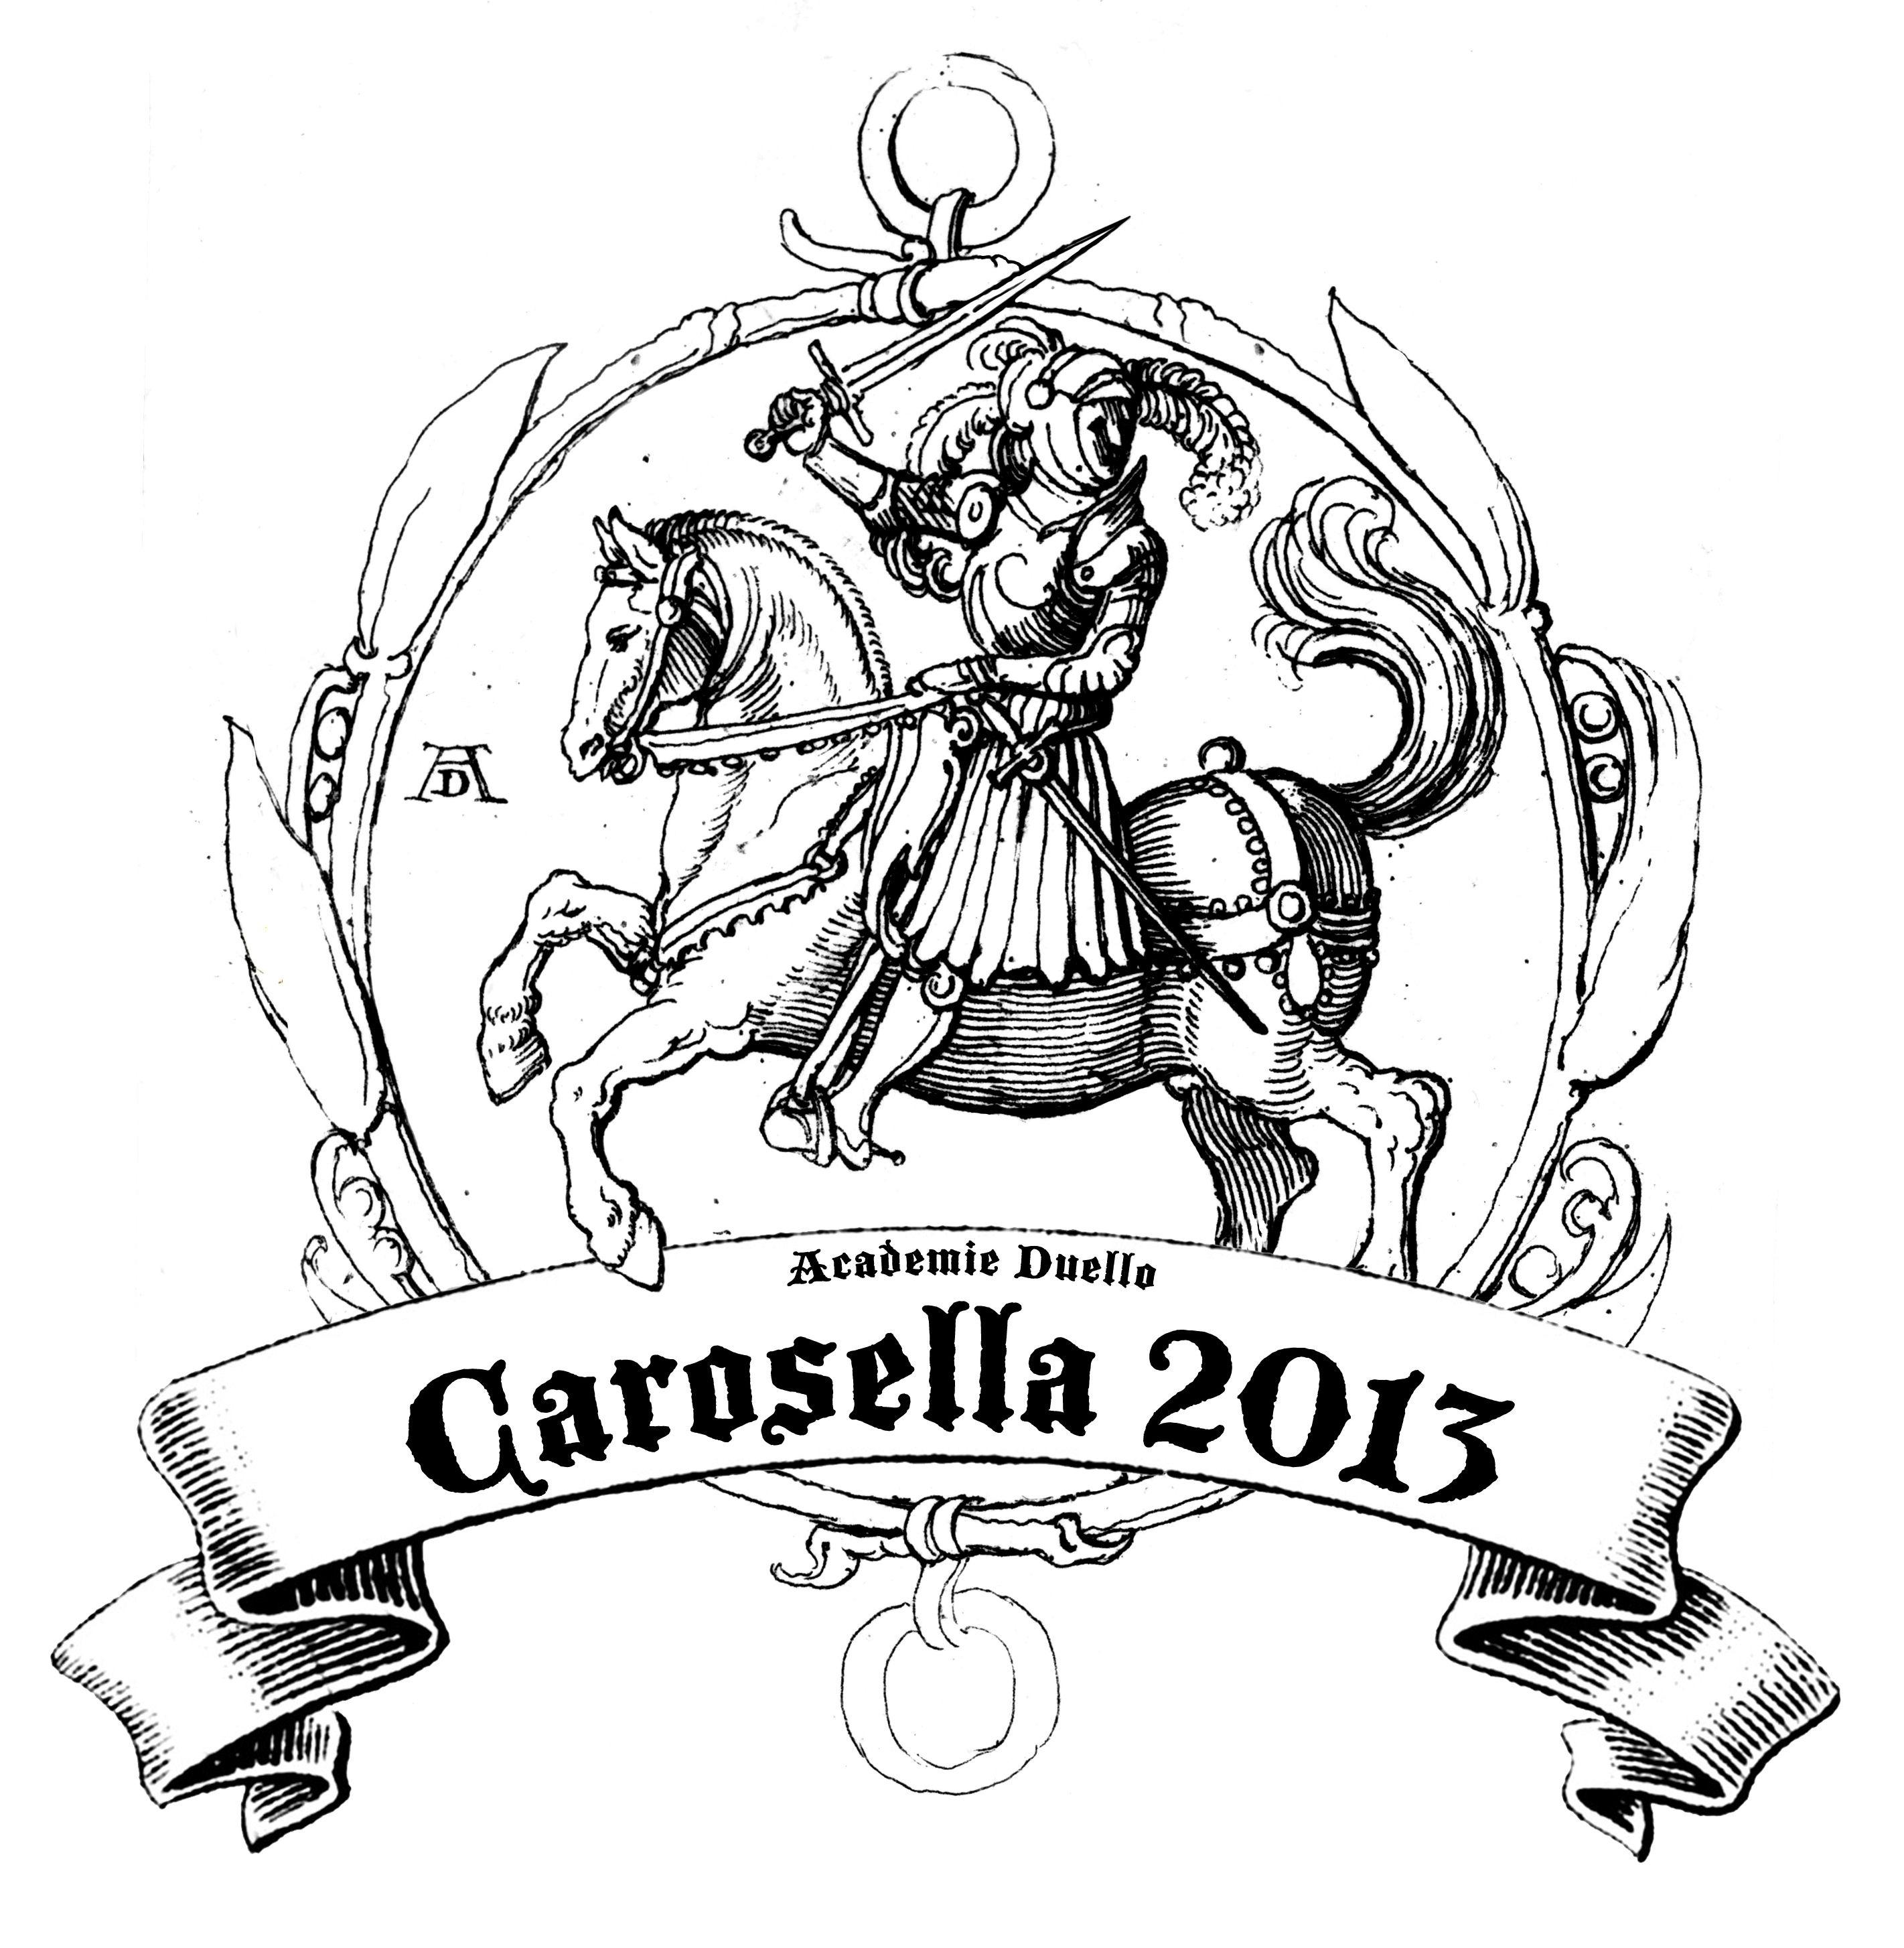 Carousella logo